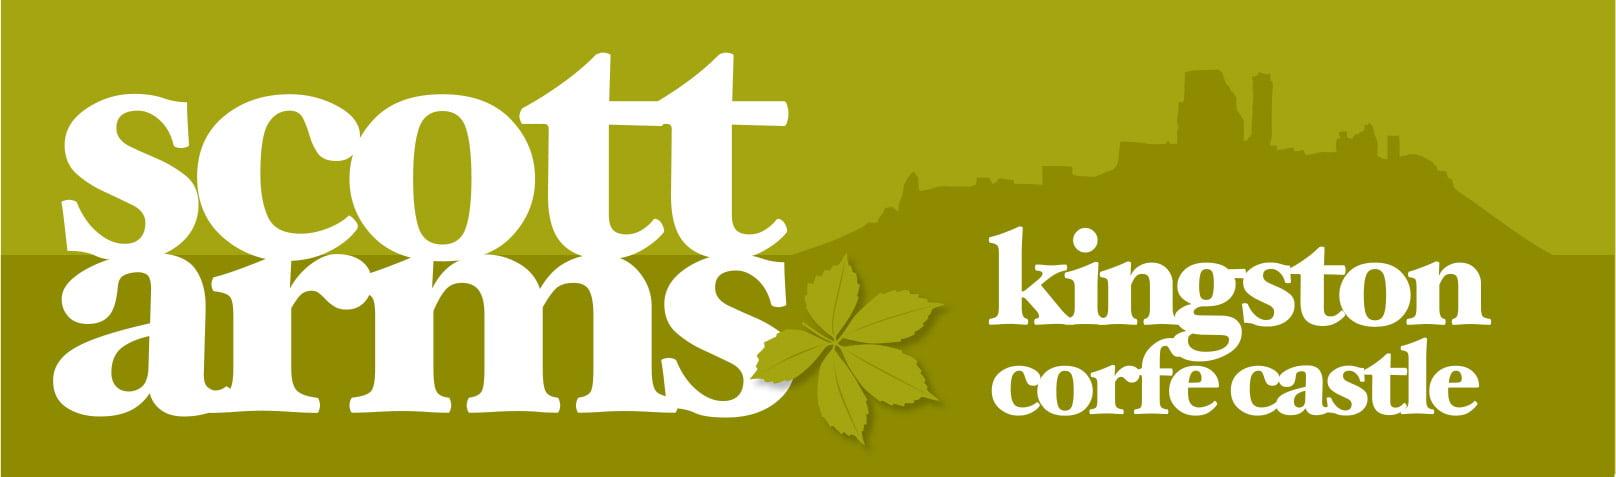 Tidal Studios | The Scott Arms logo design